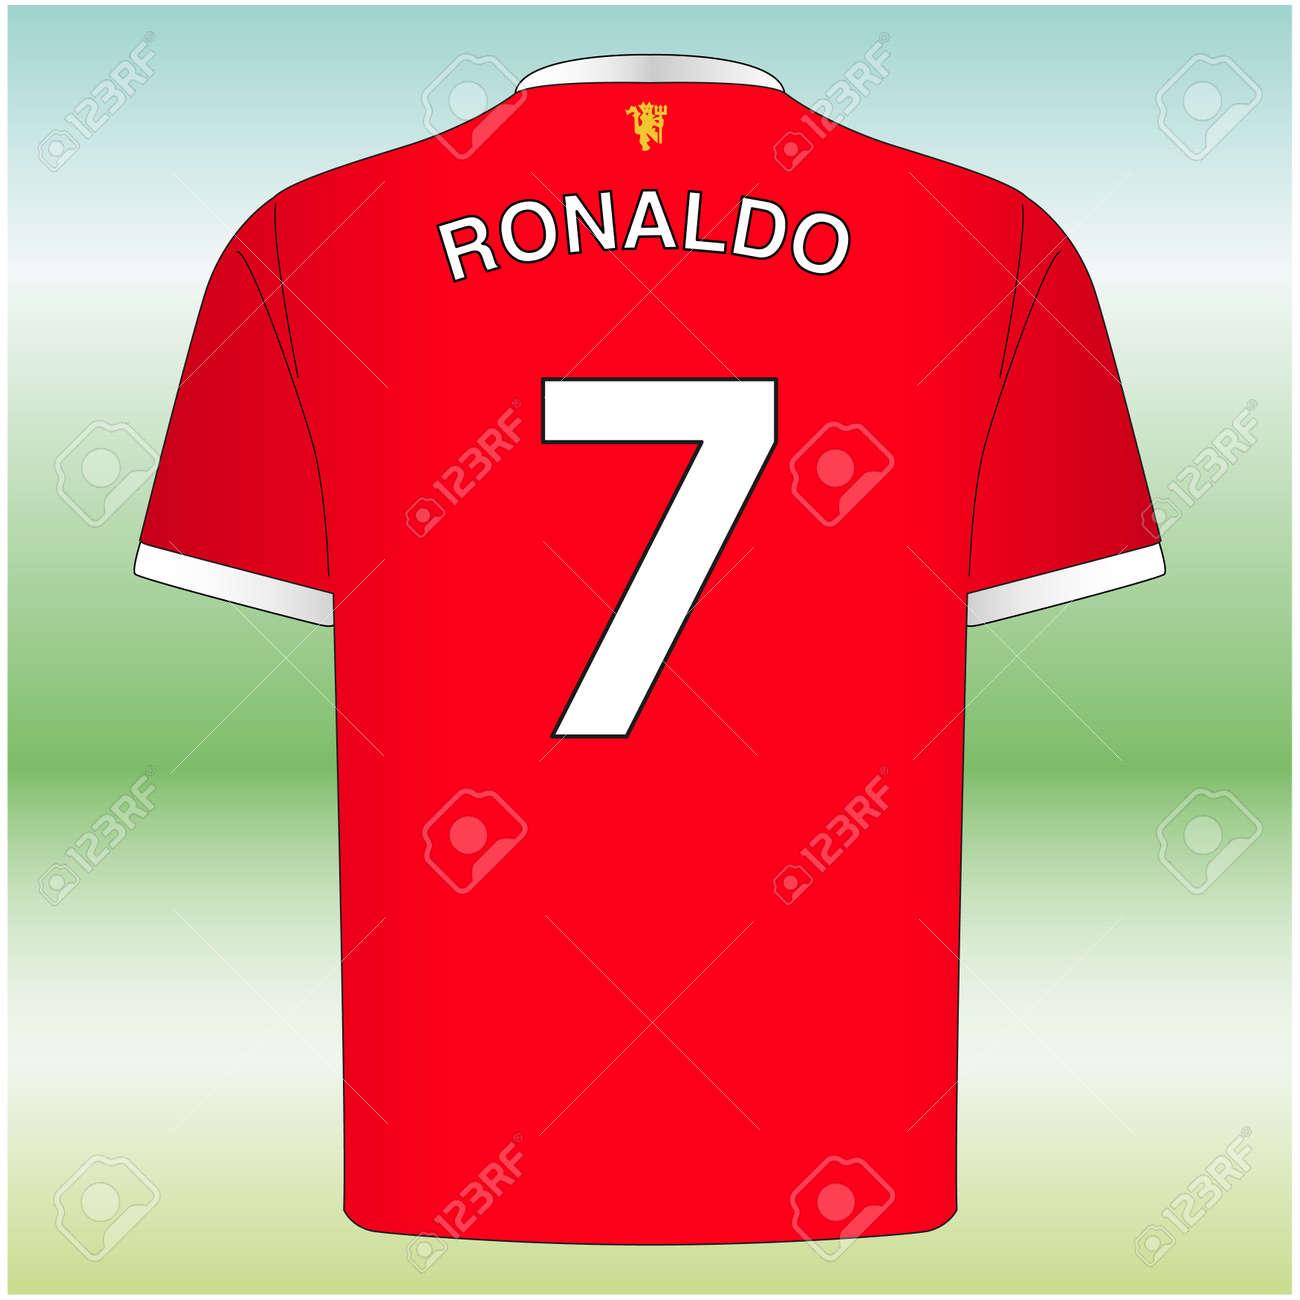 Manchester, UK, August 2021, Ronaldo number 7 shirt, new manchester united player, football team - 173485629